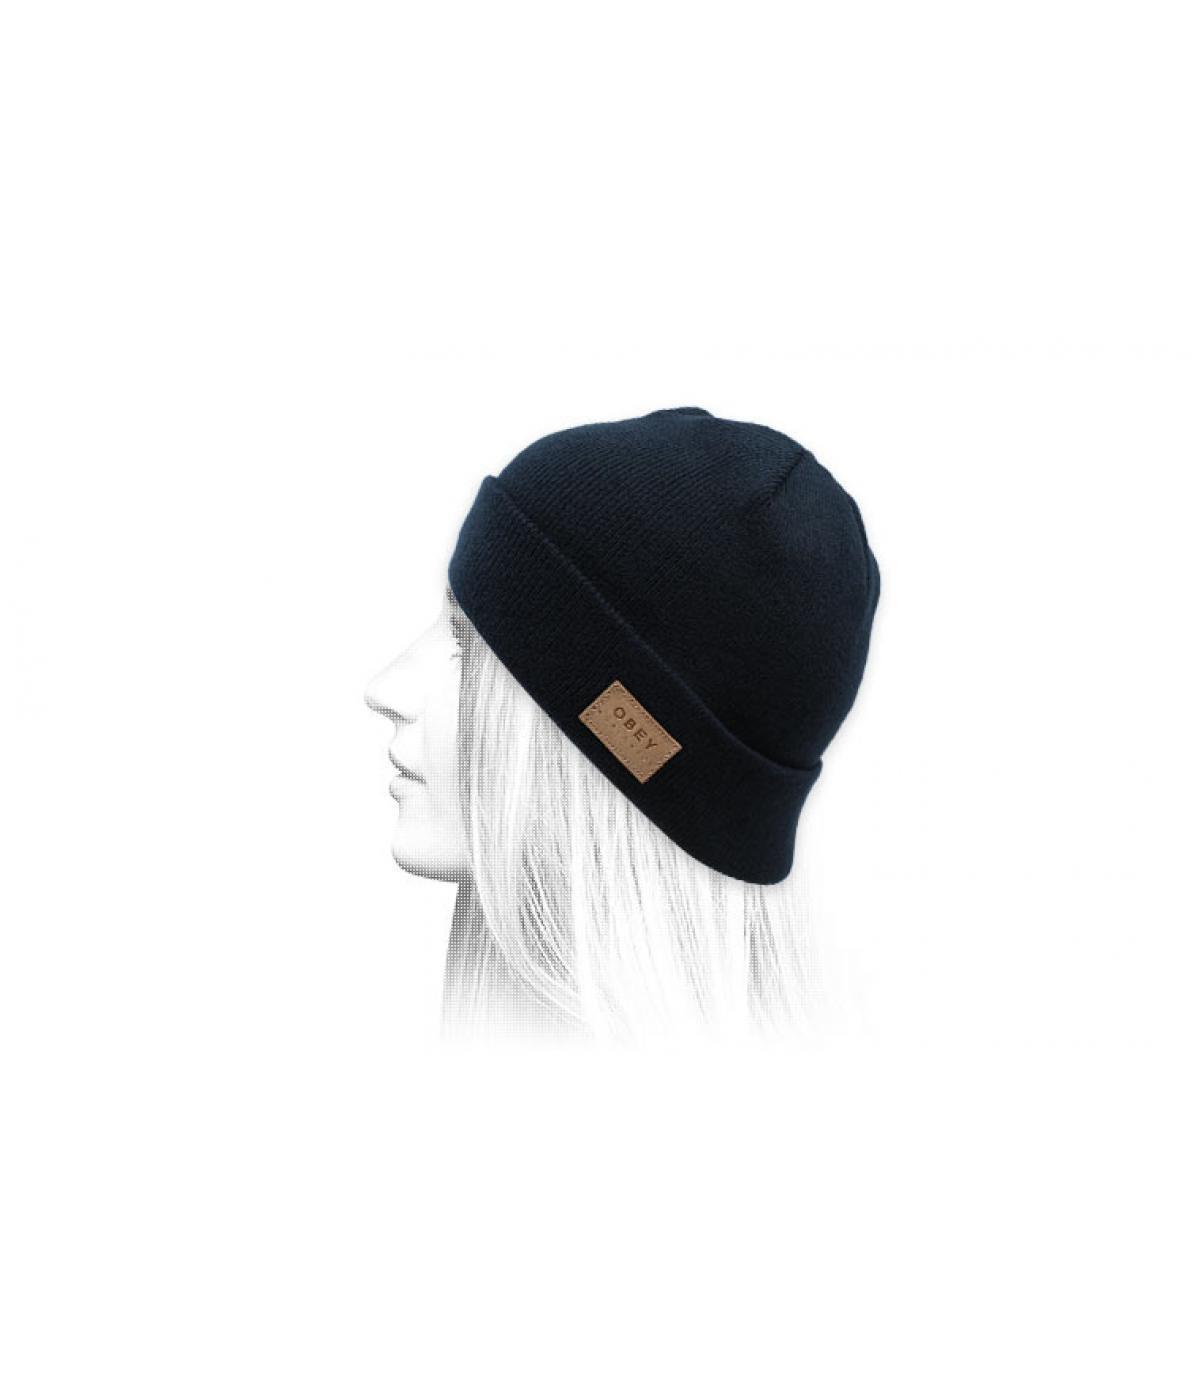 Mütze mit Rand blau Obey